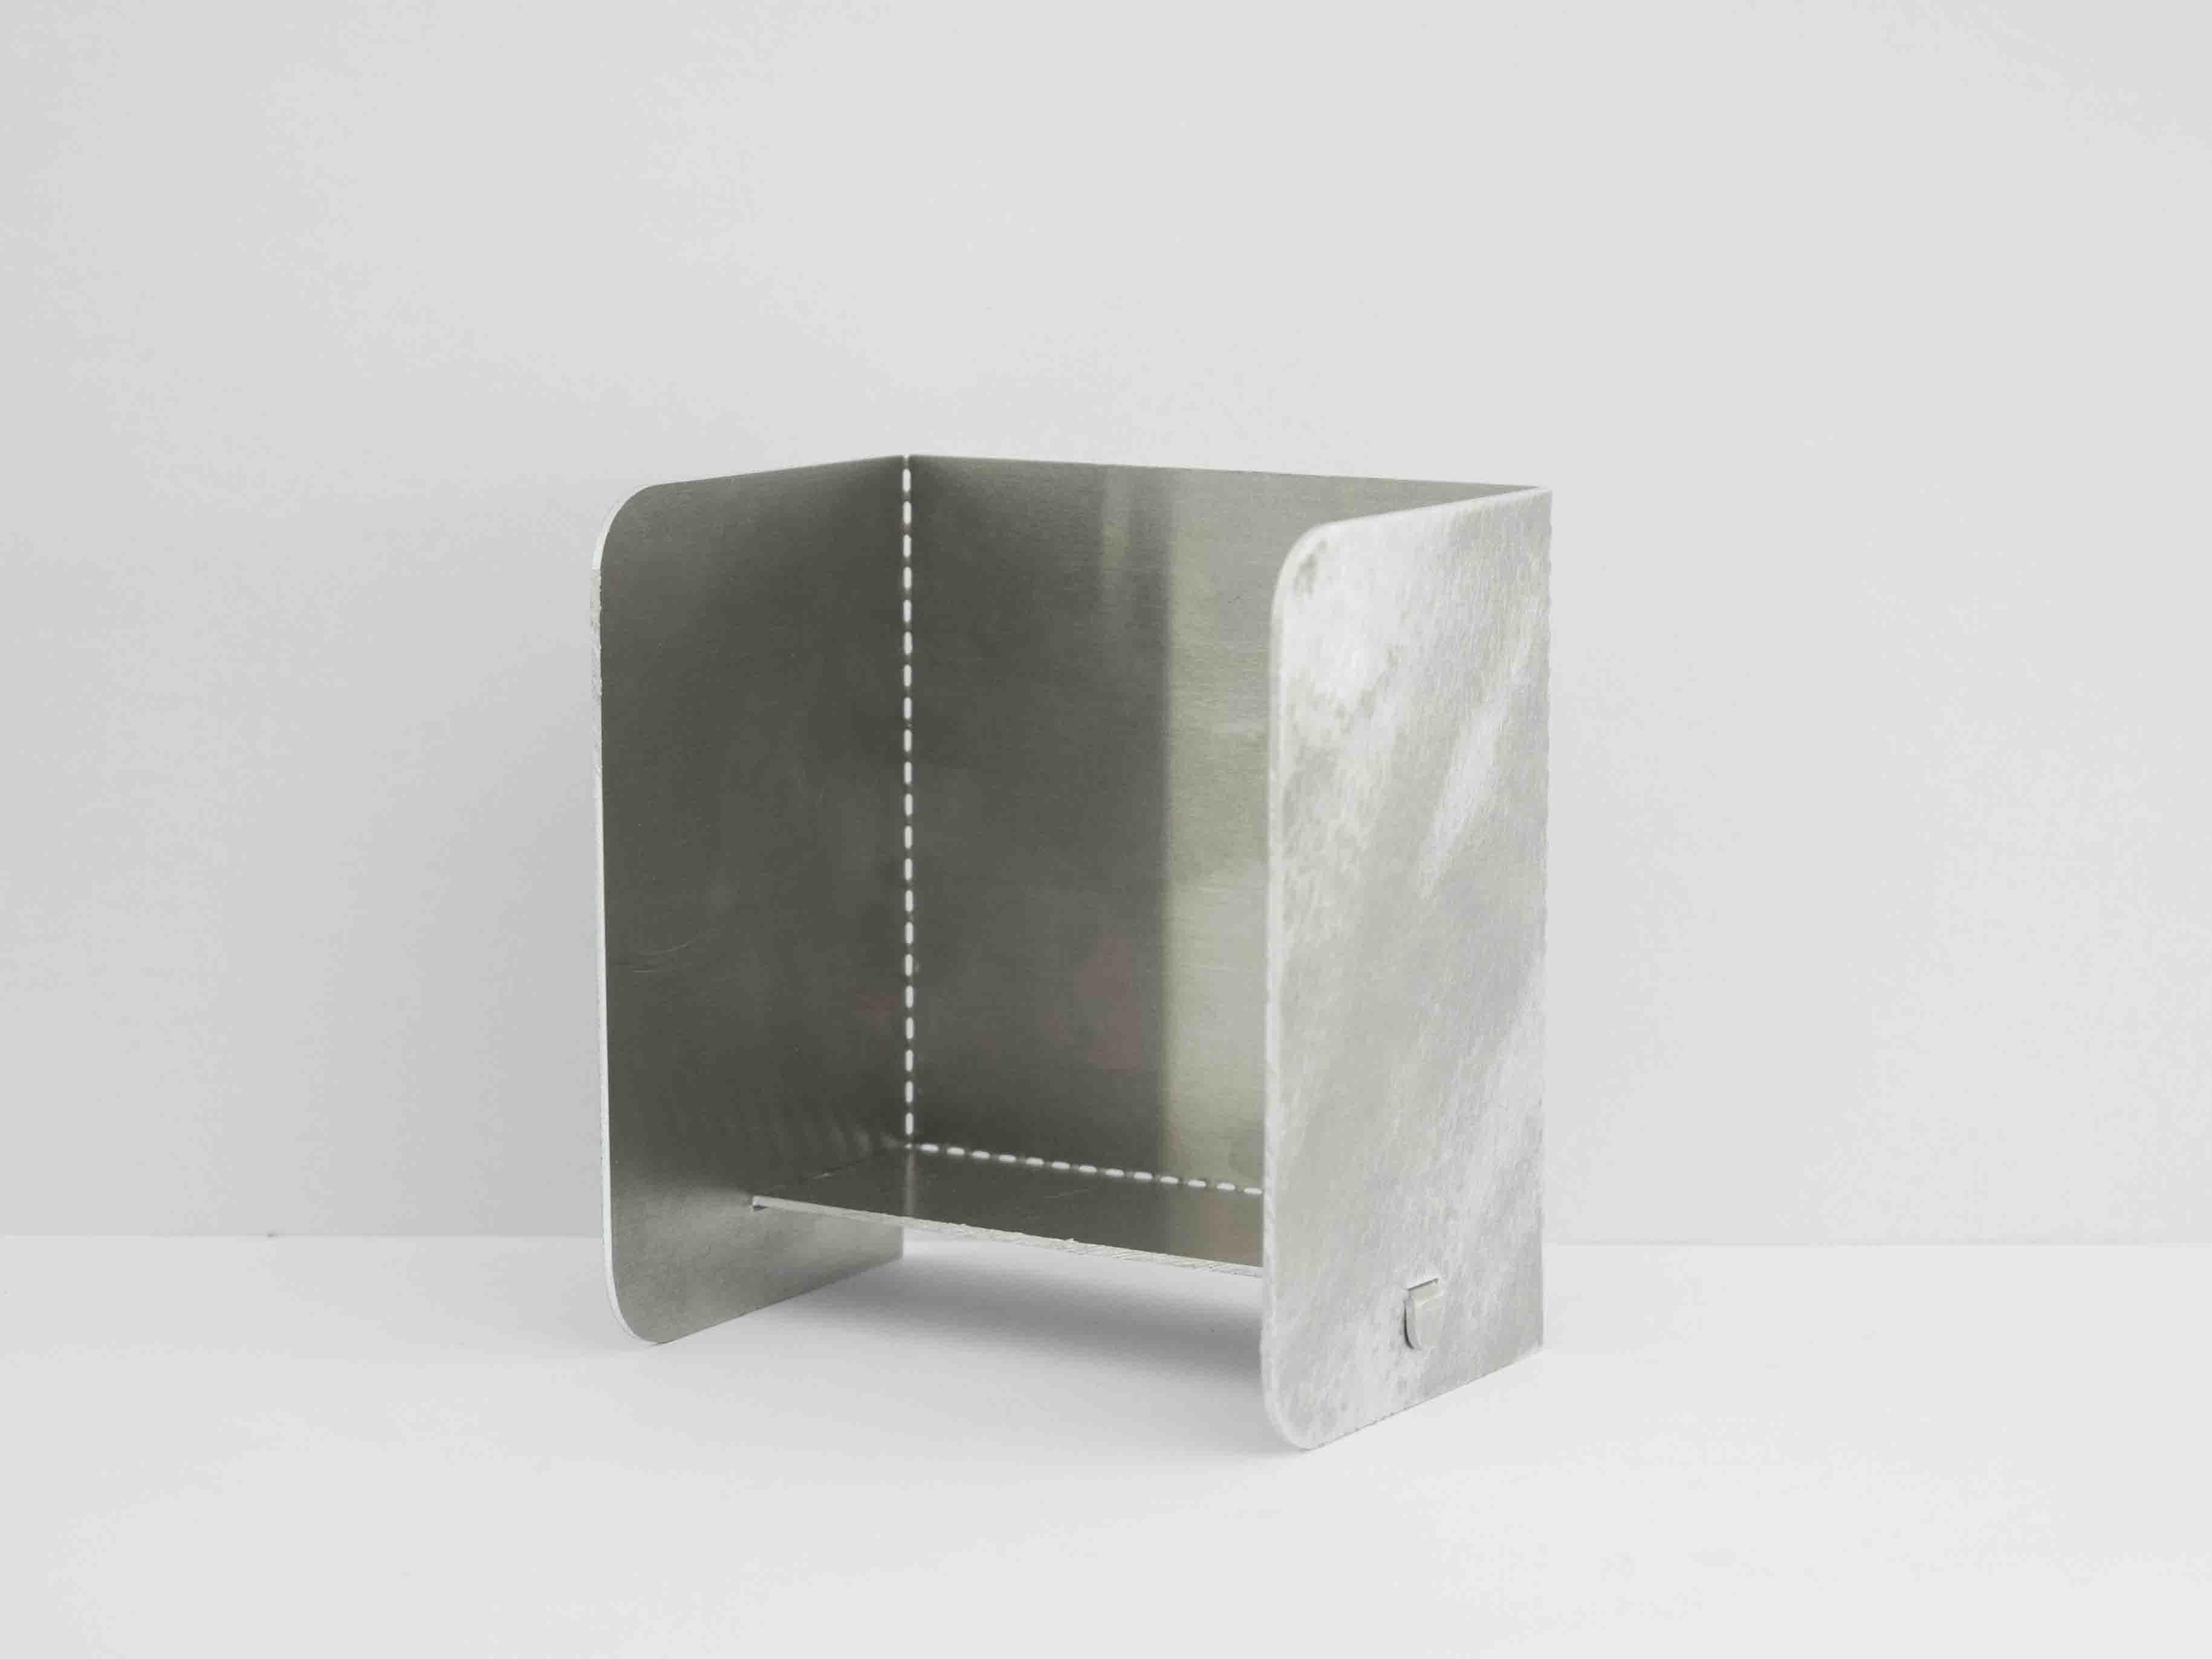 laser cut metal box